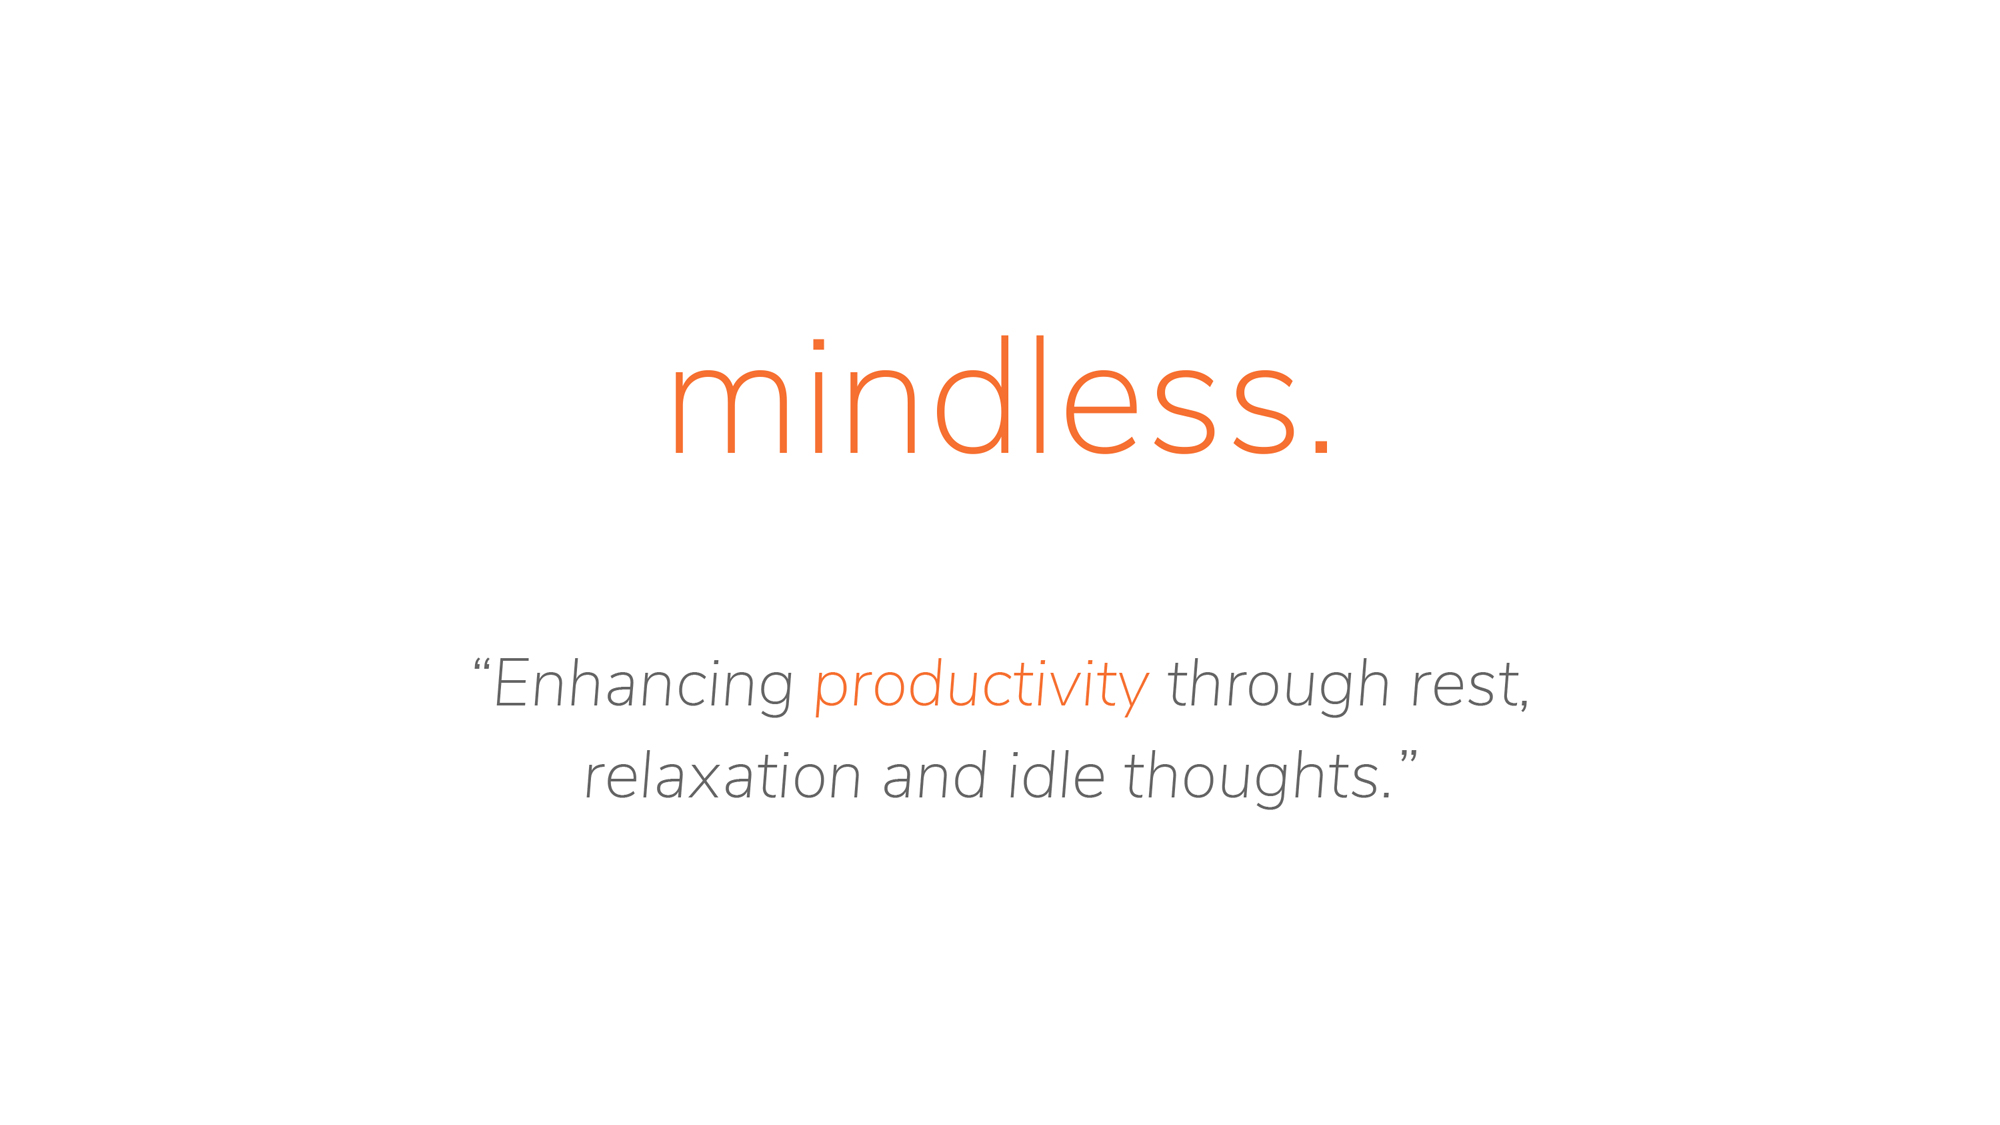 mindless1.jpg